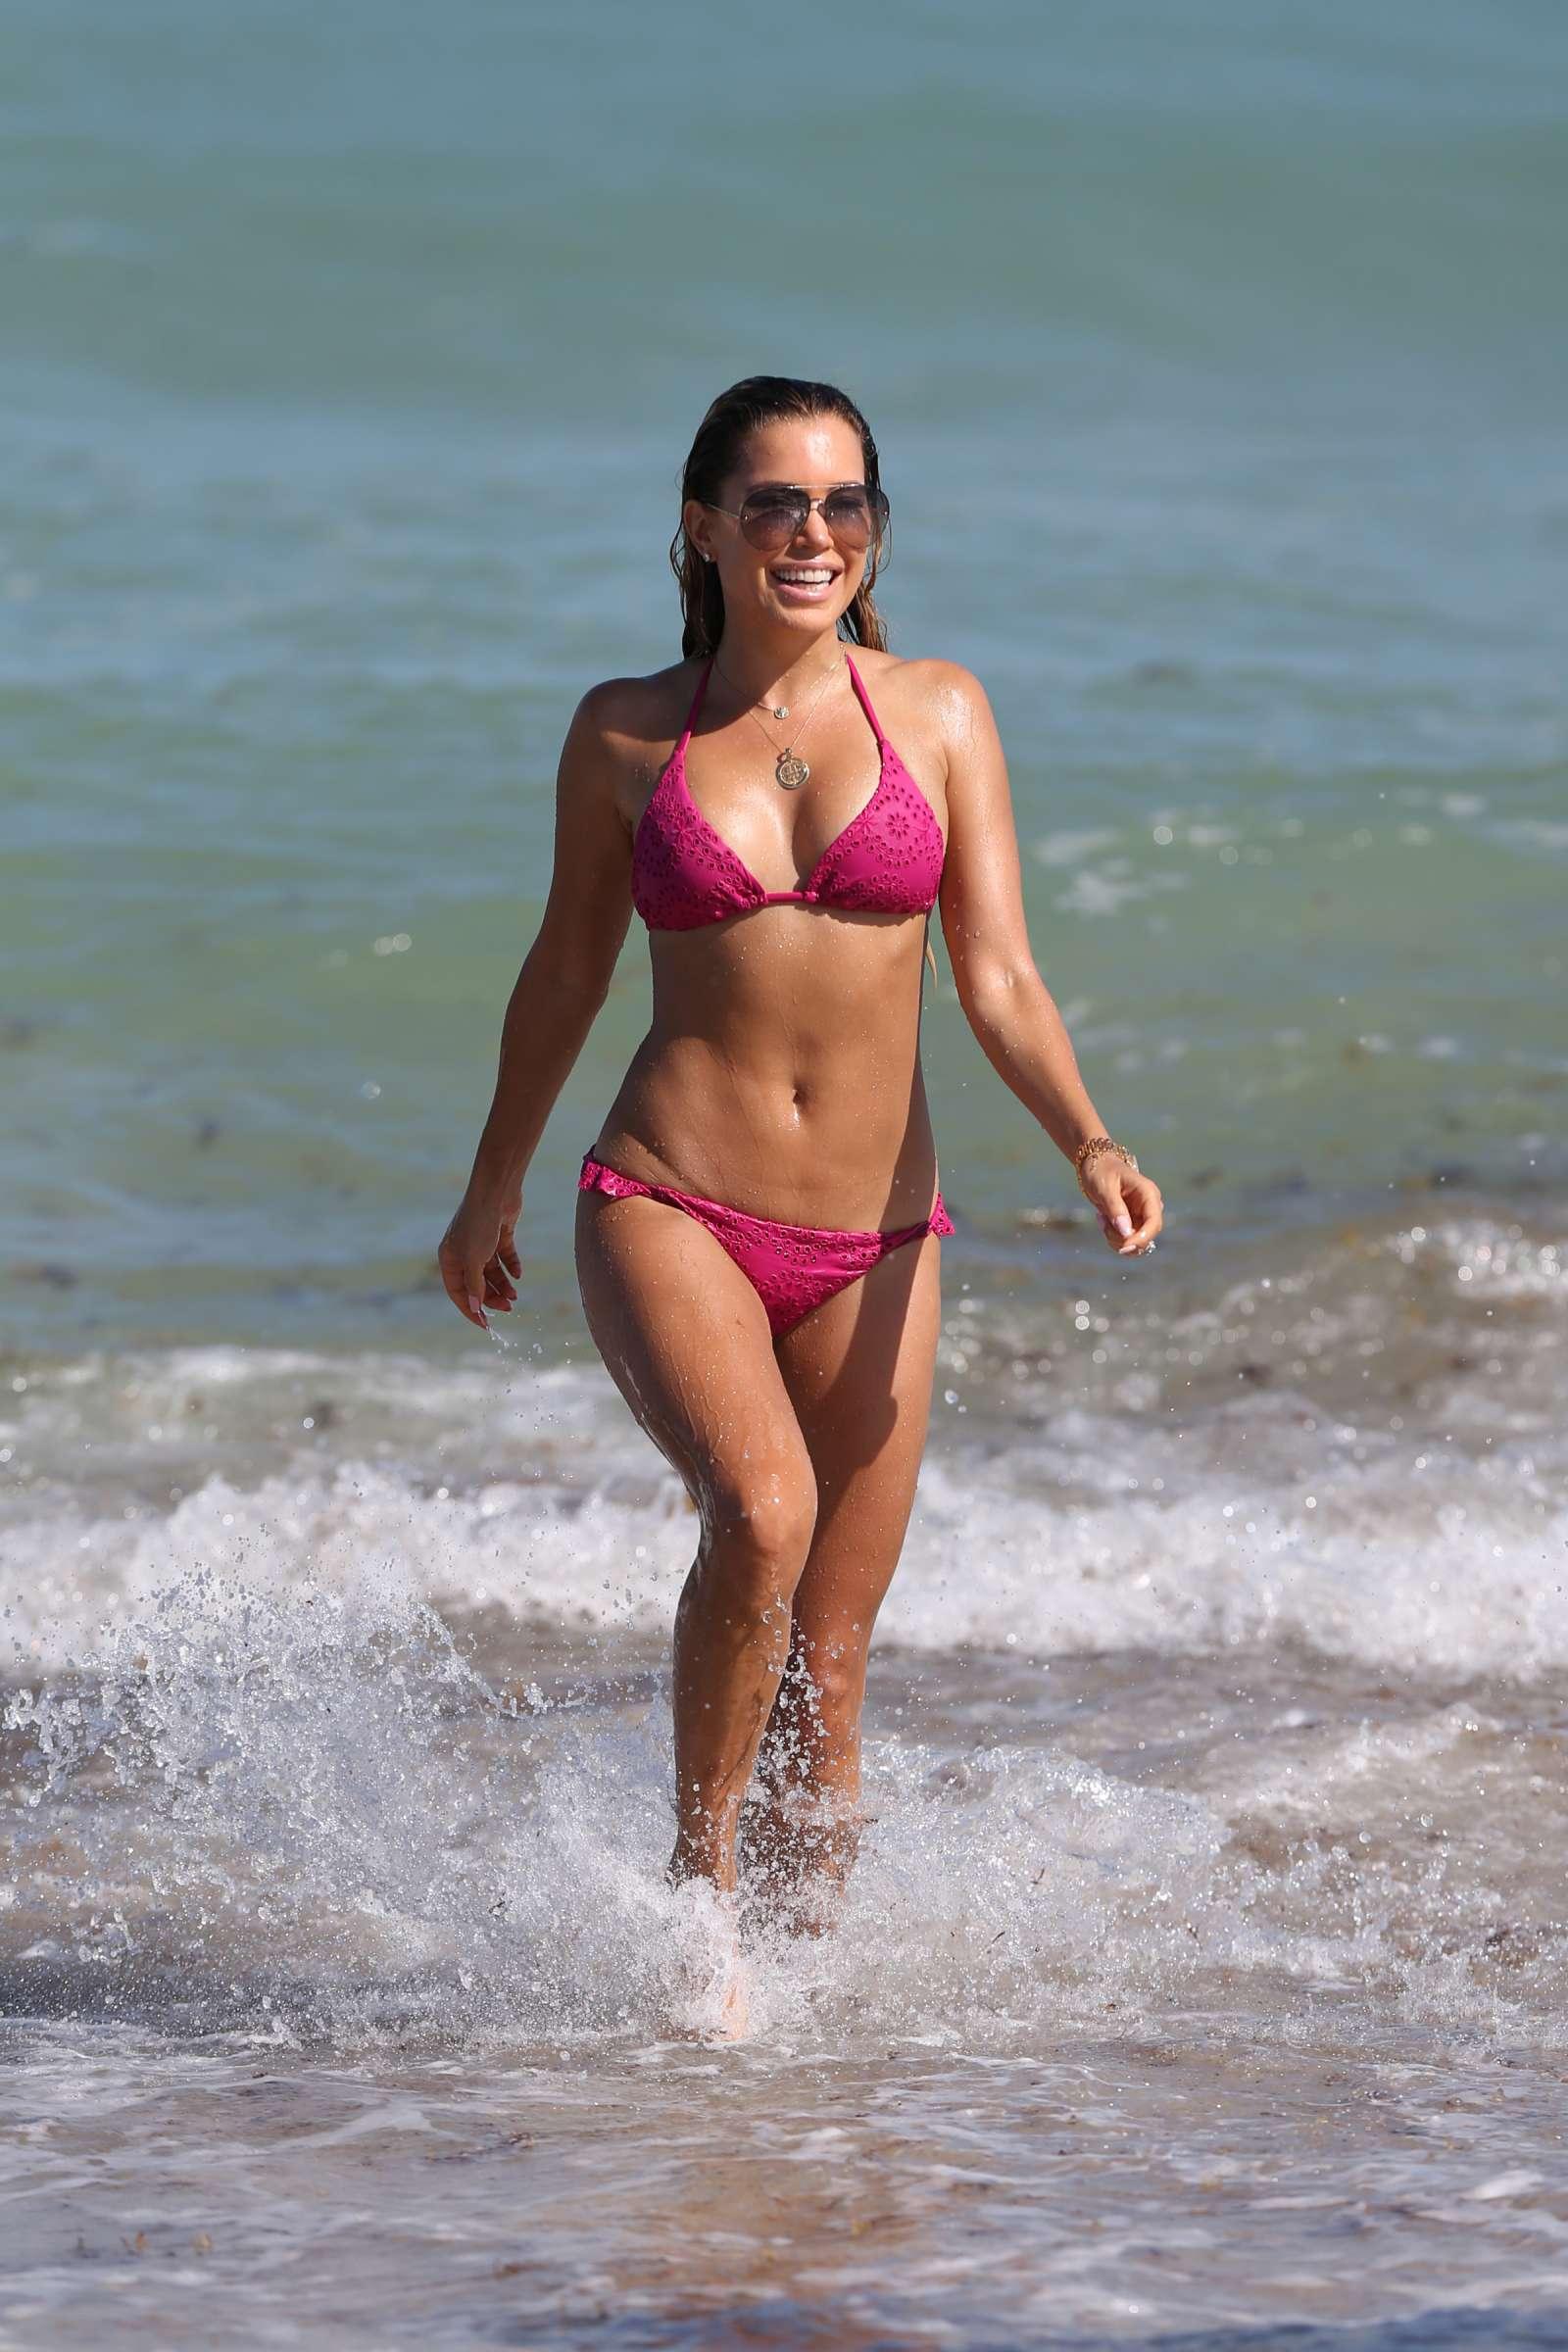 Sylvie Meis 2018 : Sylvie Meis in Pink Bikini 2018 -22